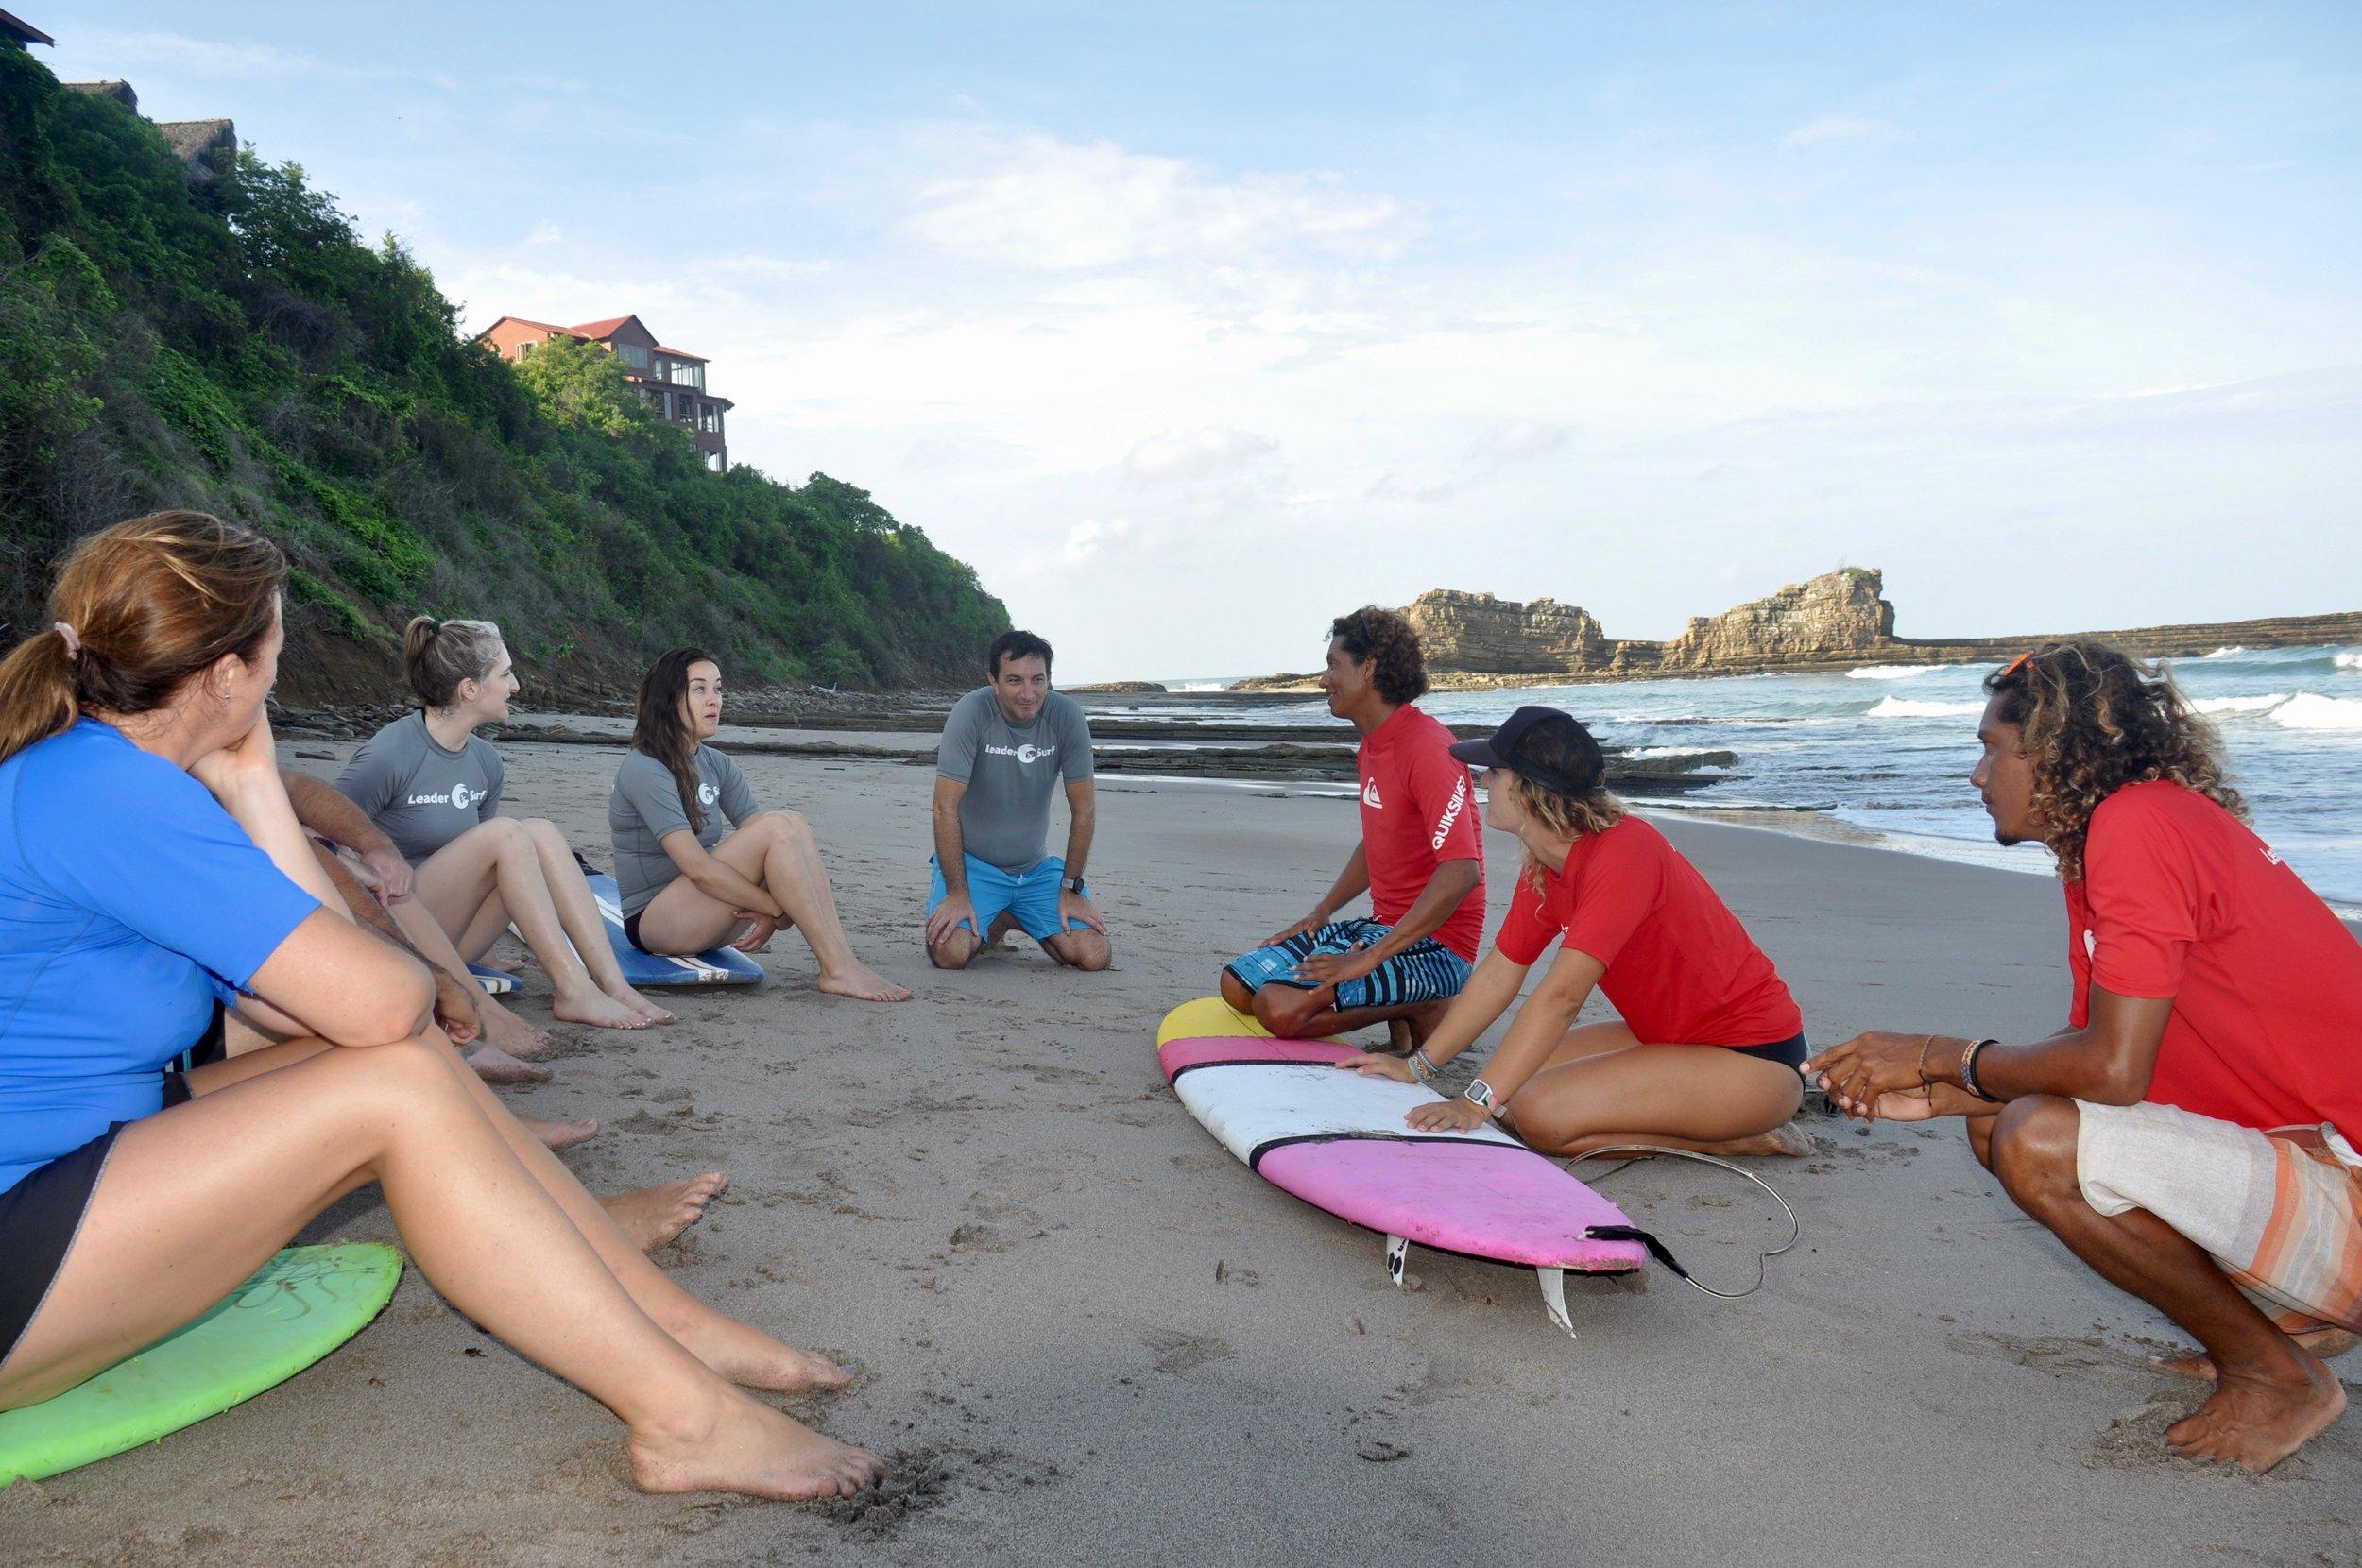 LeaderSurf Beach Lesson